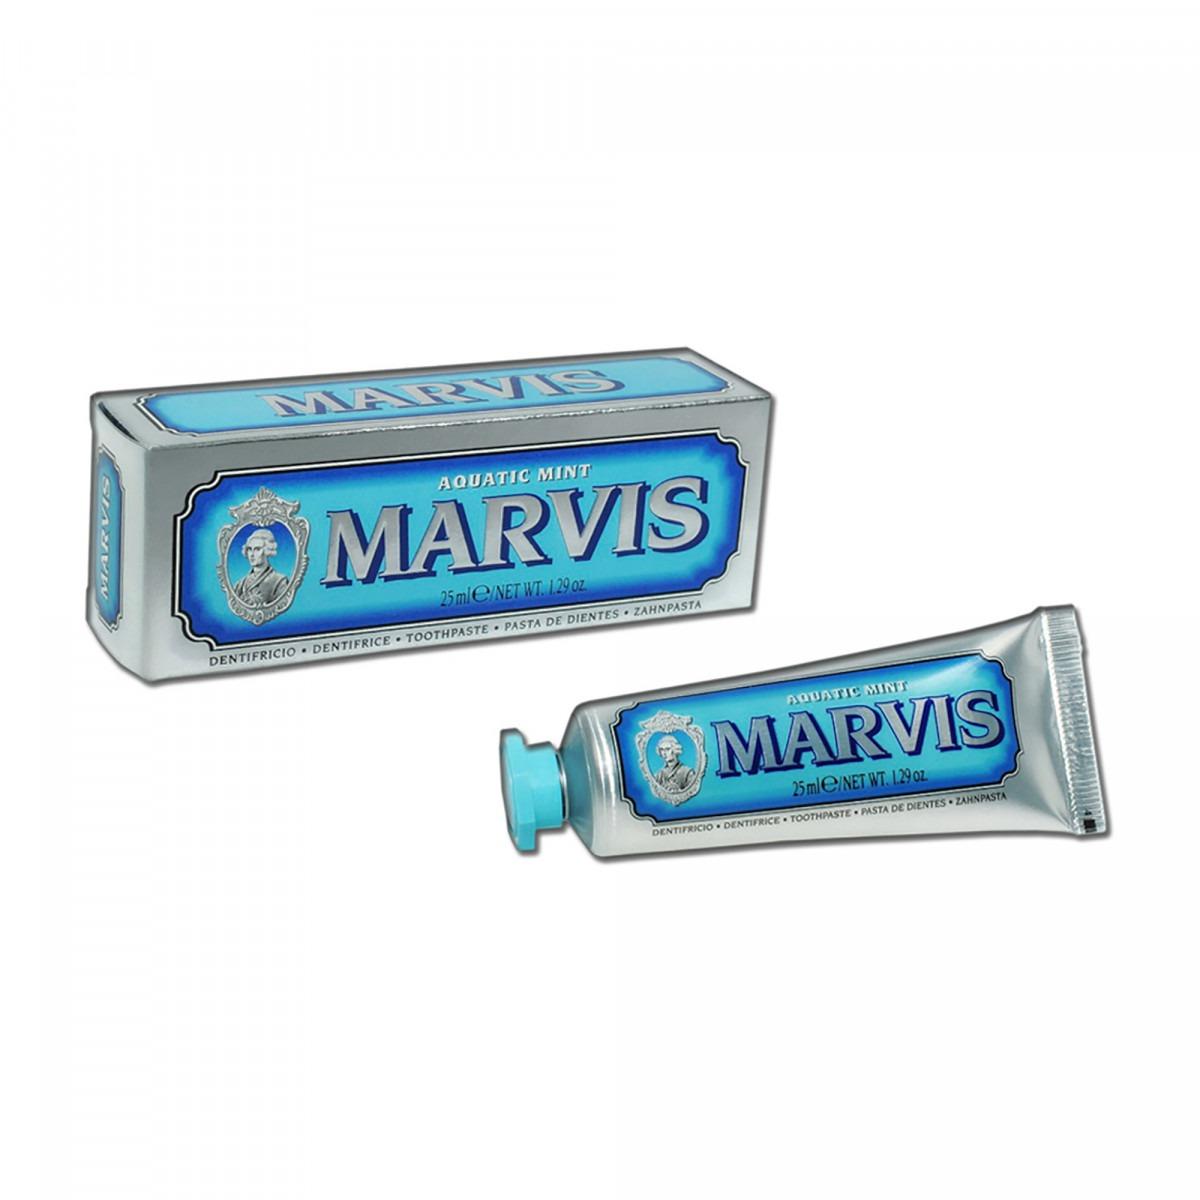 Marvis toothpaste aquatic mint 25 ml